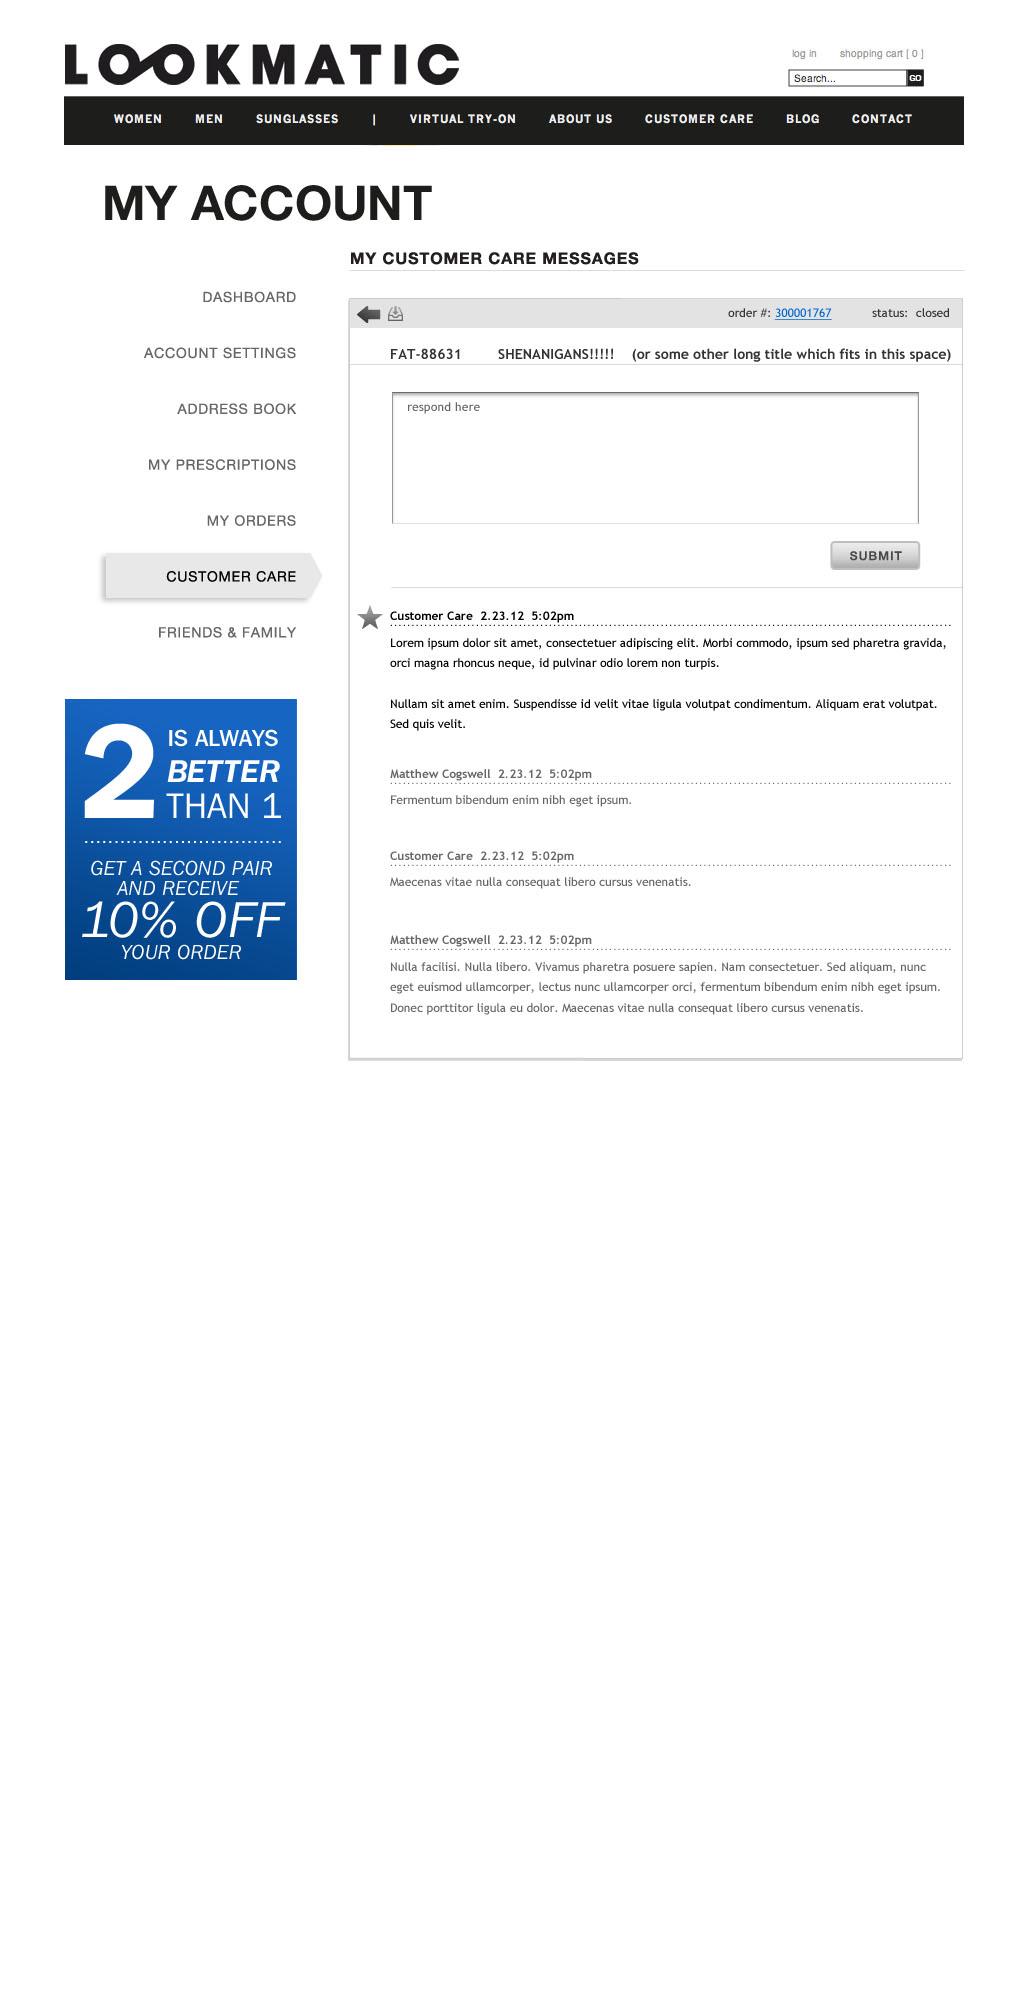 33 - Customer Care (msg)